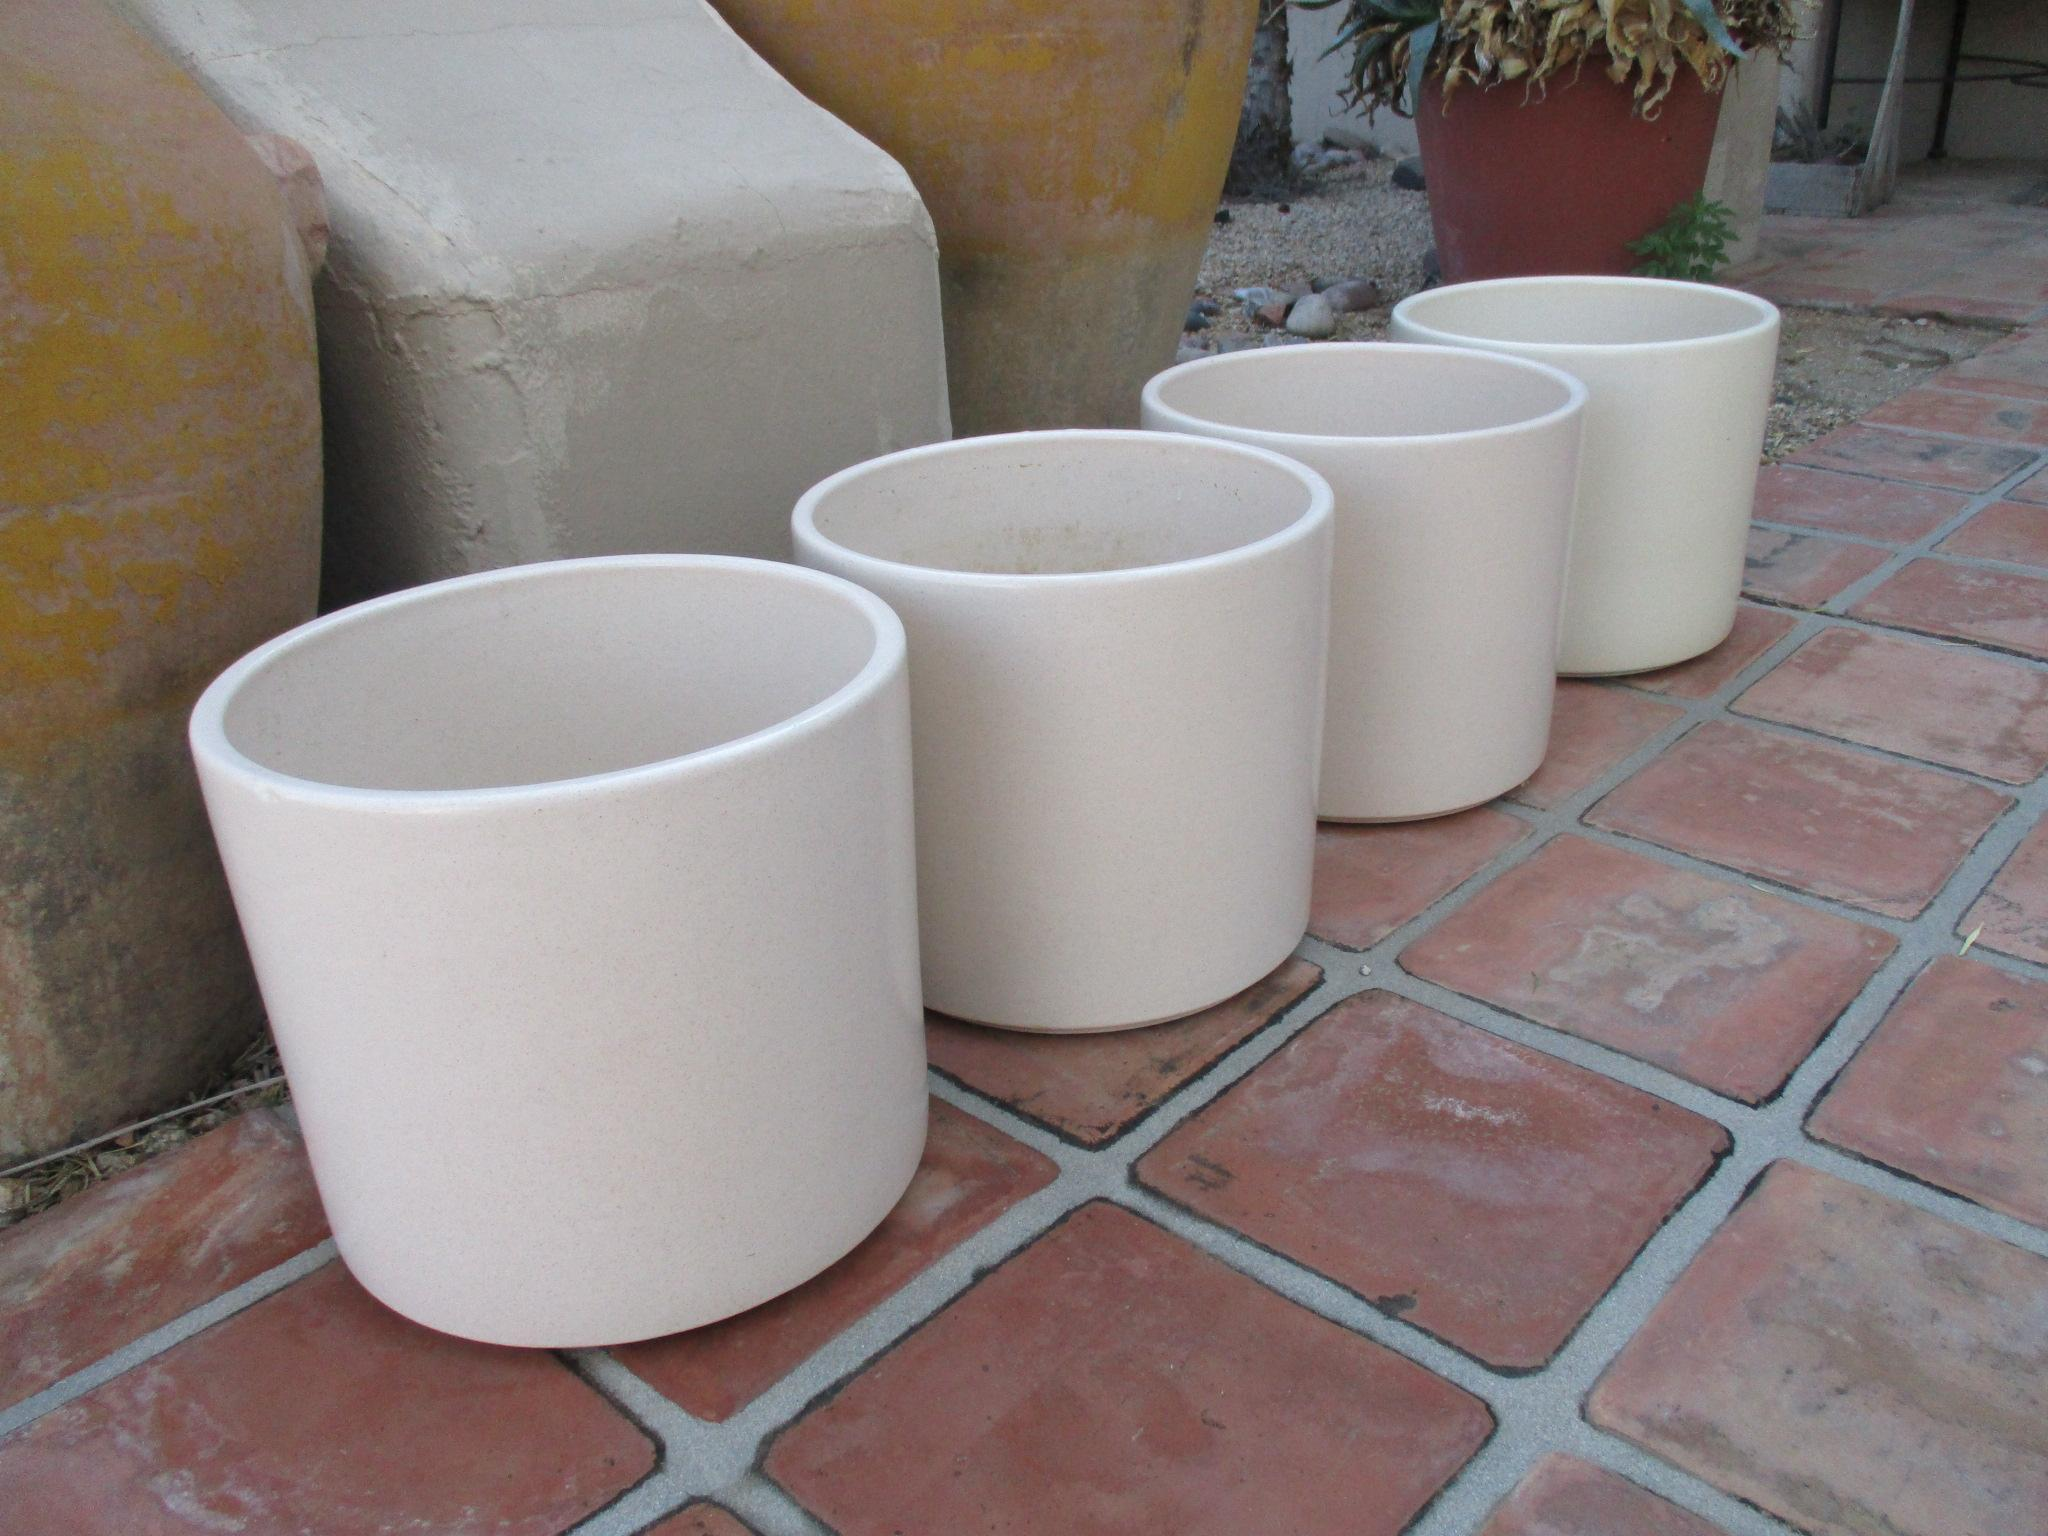 Ideal Gainey Mid Century Modern Planter Pots Pot - Set 4   Chairish DF39